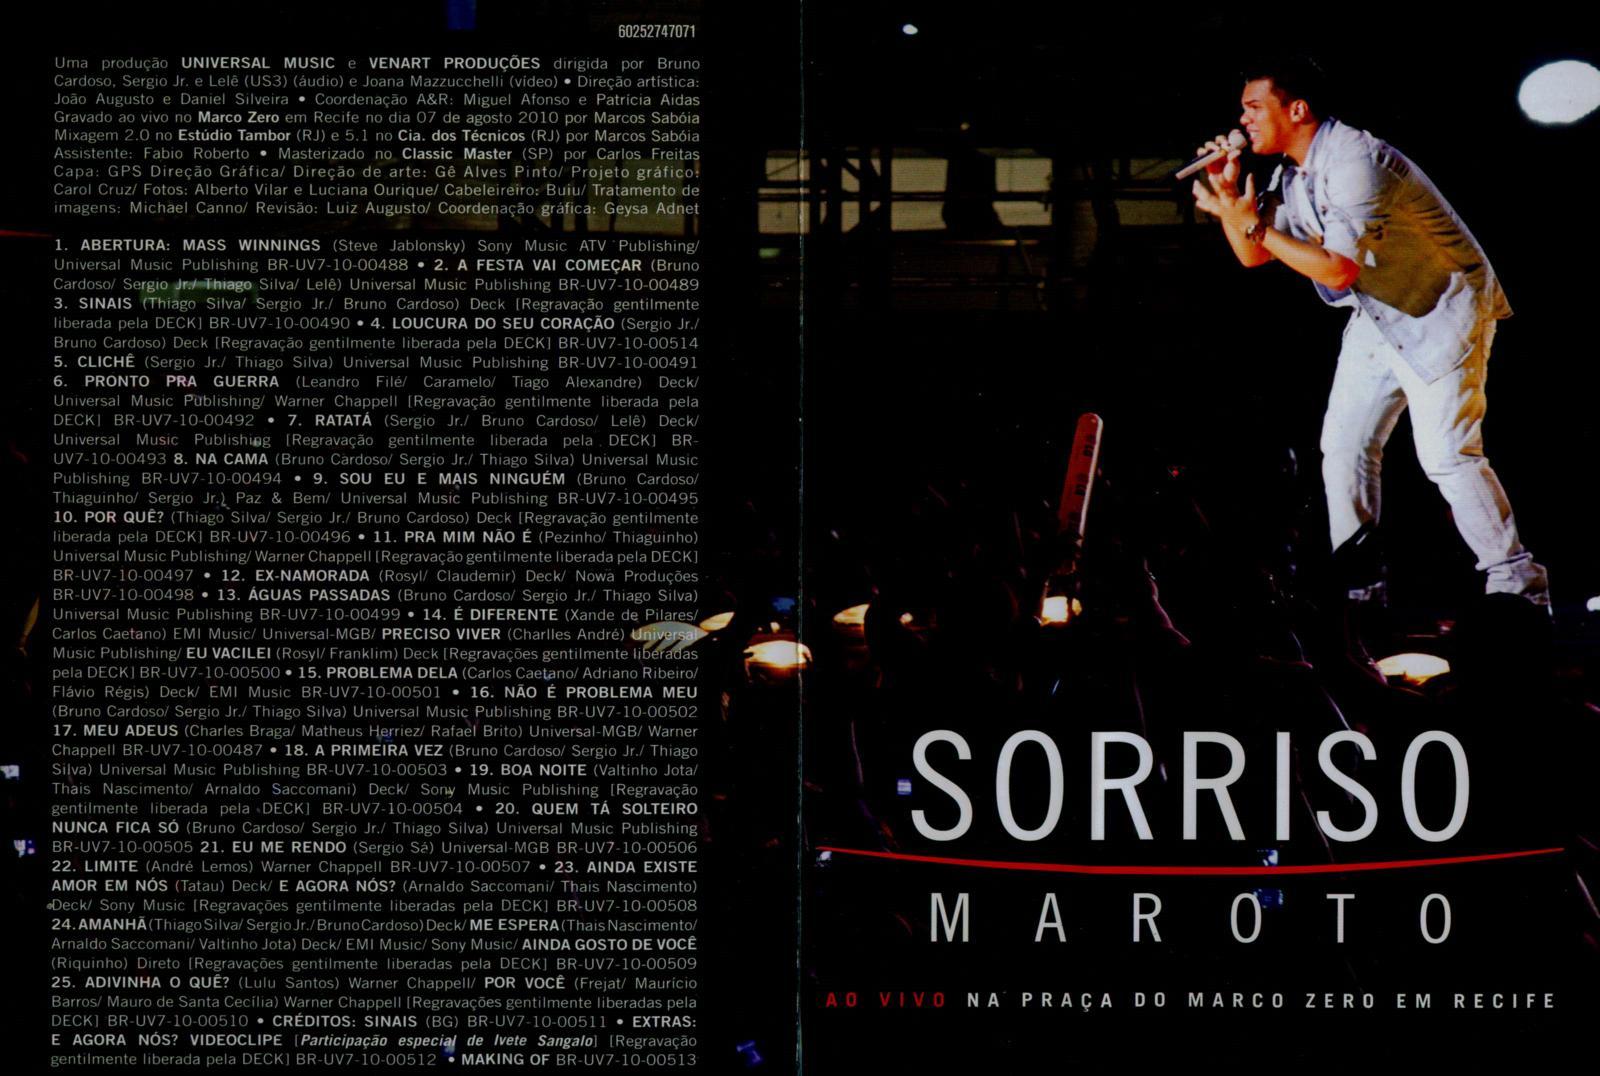 dvd show sorriso maroto ao vivo 2012